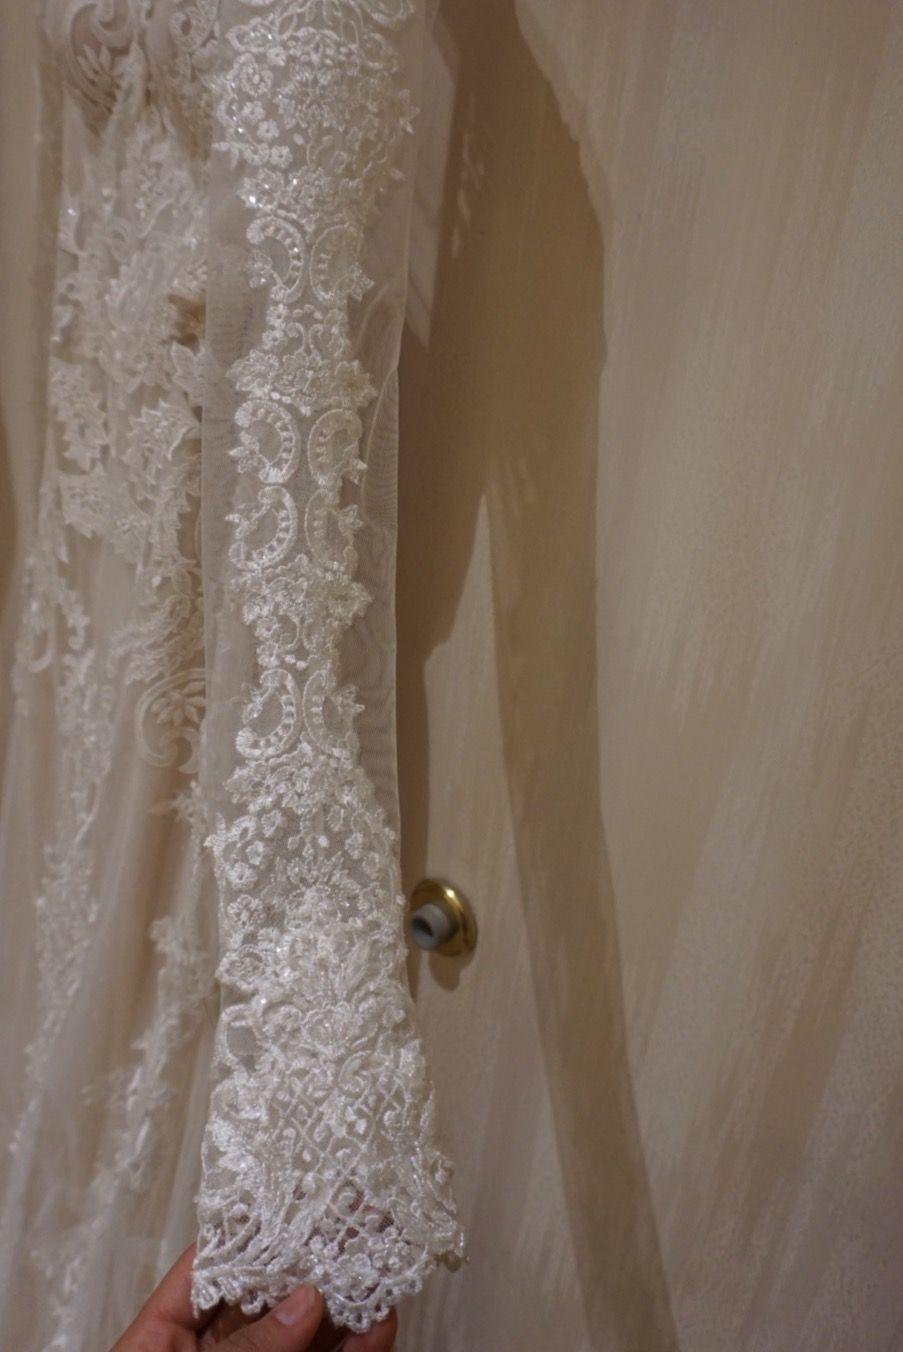 Lace up back wedding dress november 2018 Galia Lahav  Sleeve Detail  Designer Destination Weddings